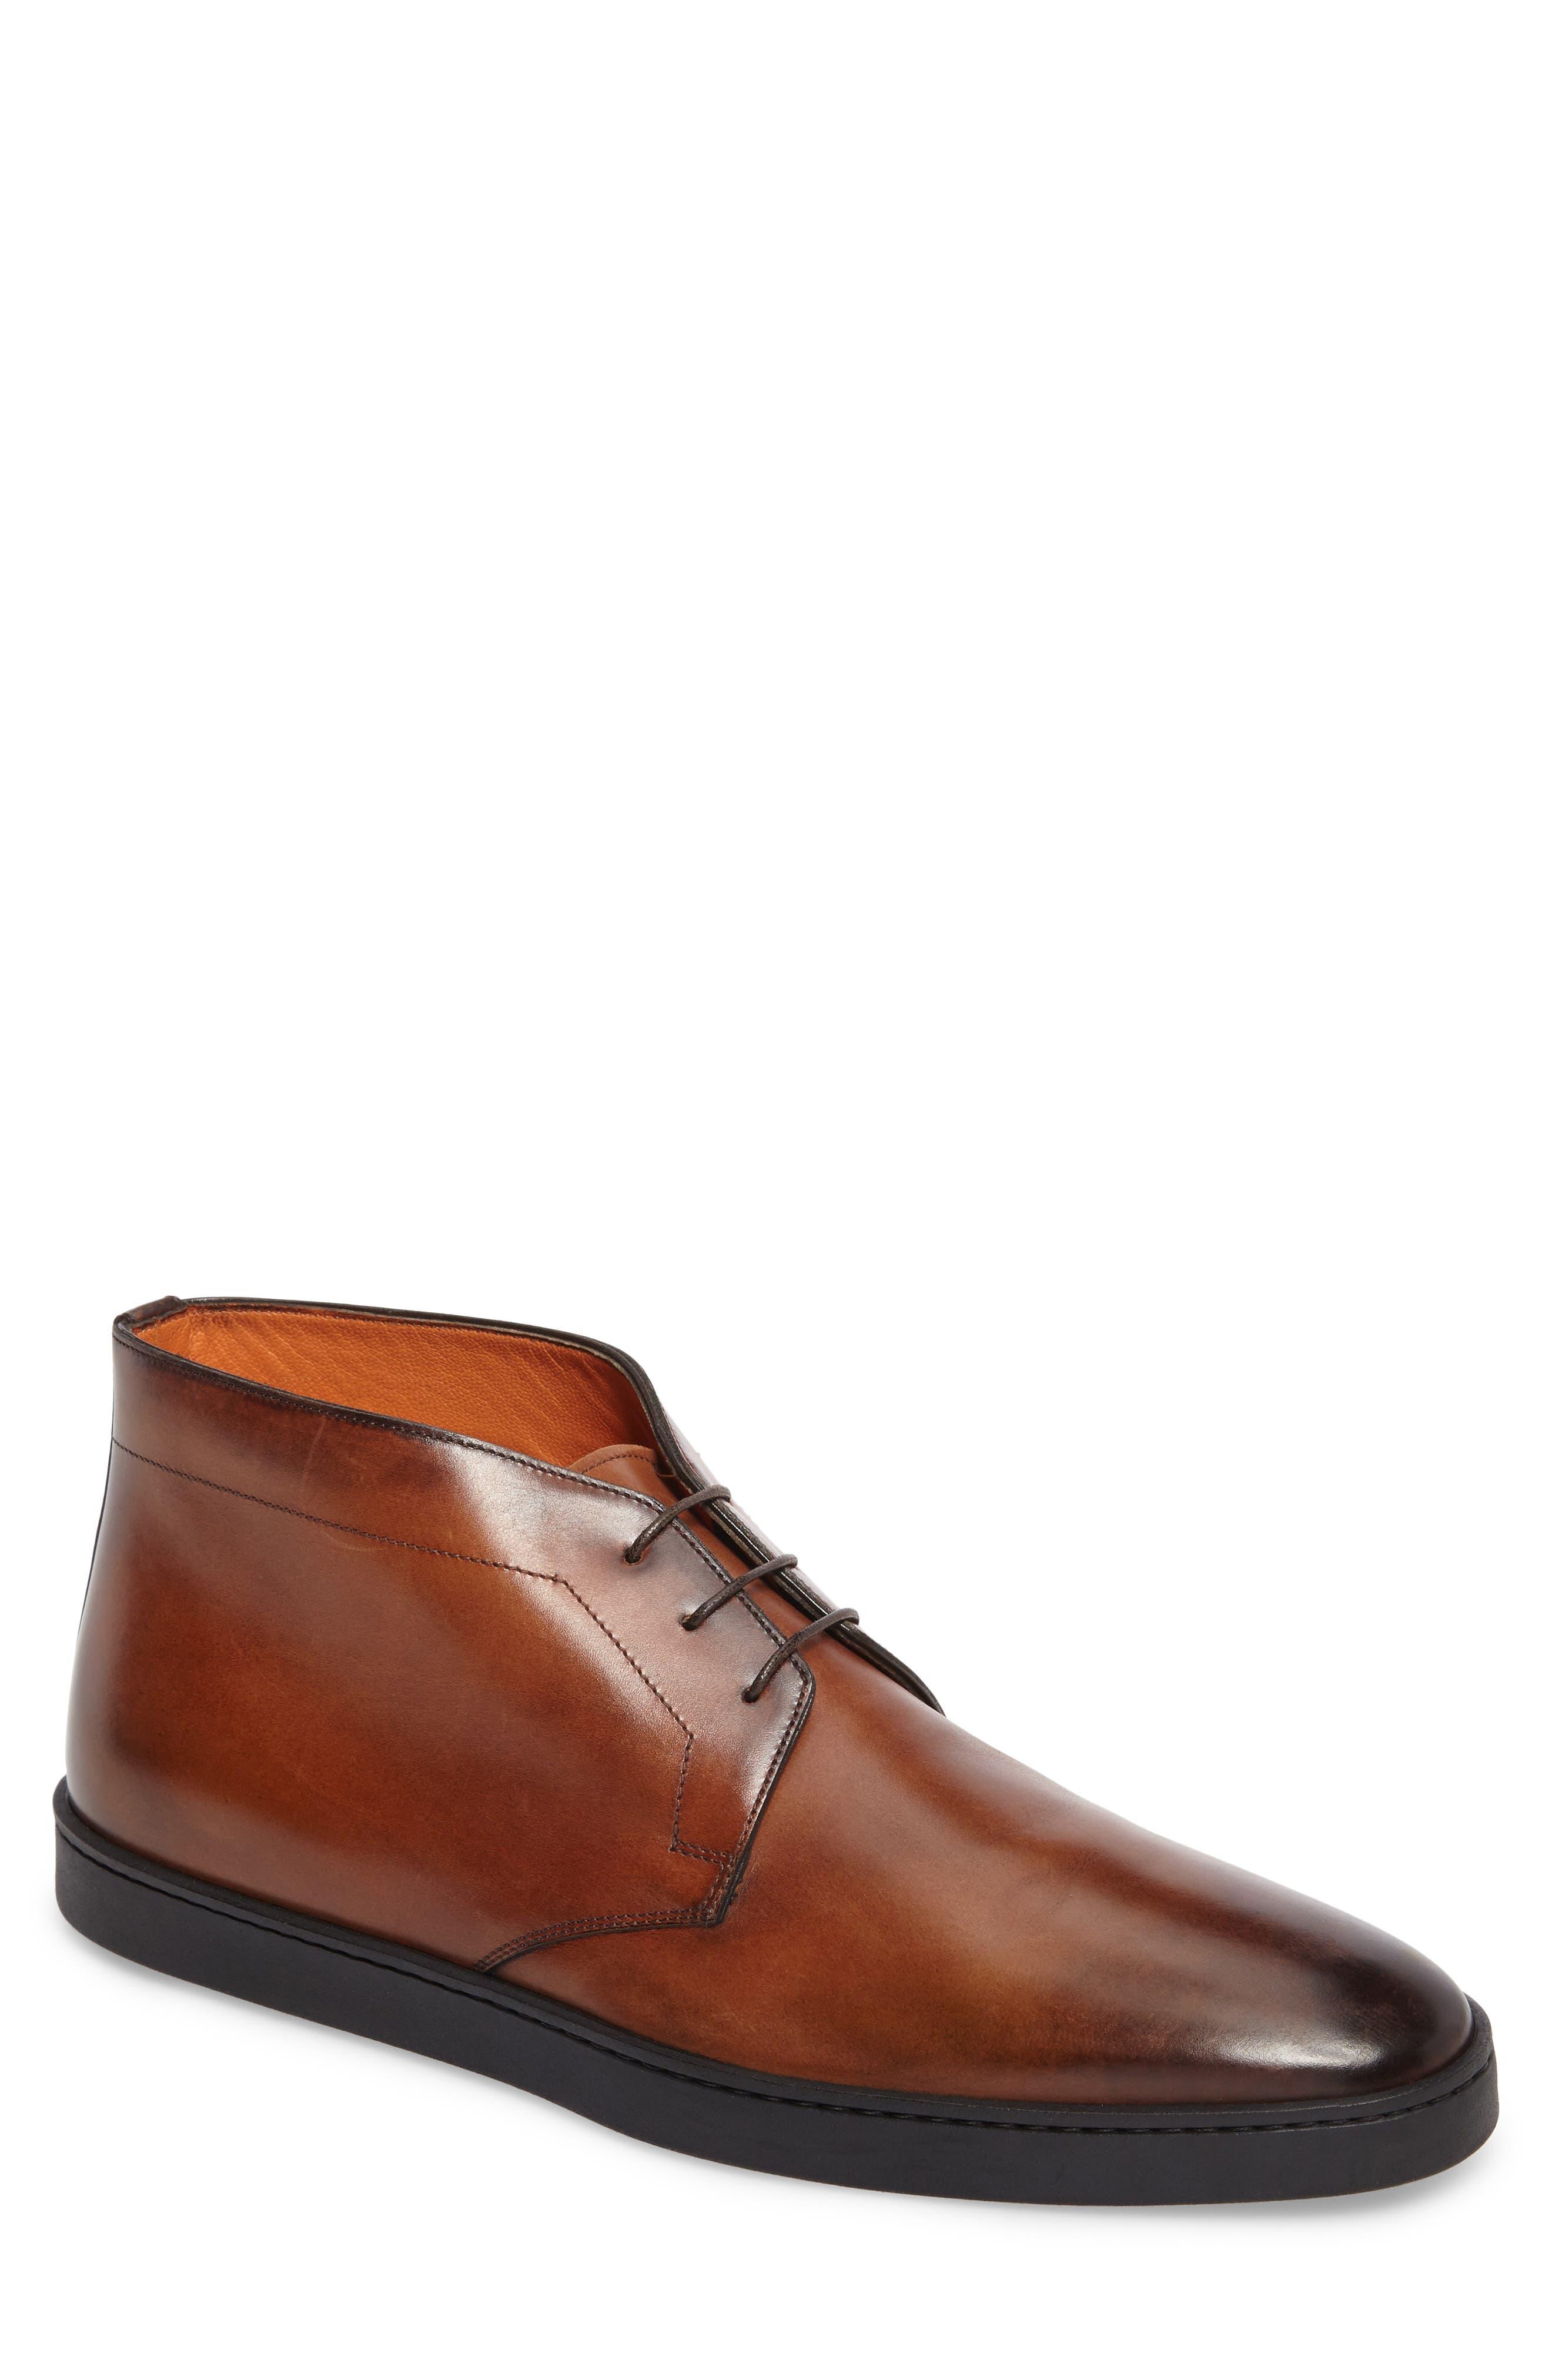 Eddy Chukka Sneaker Boot,                         Main,                         color, Brown